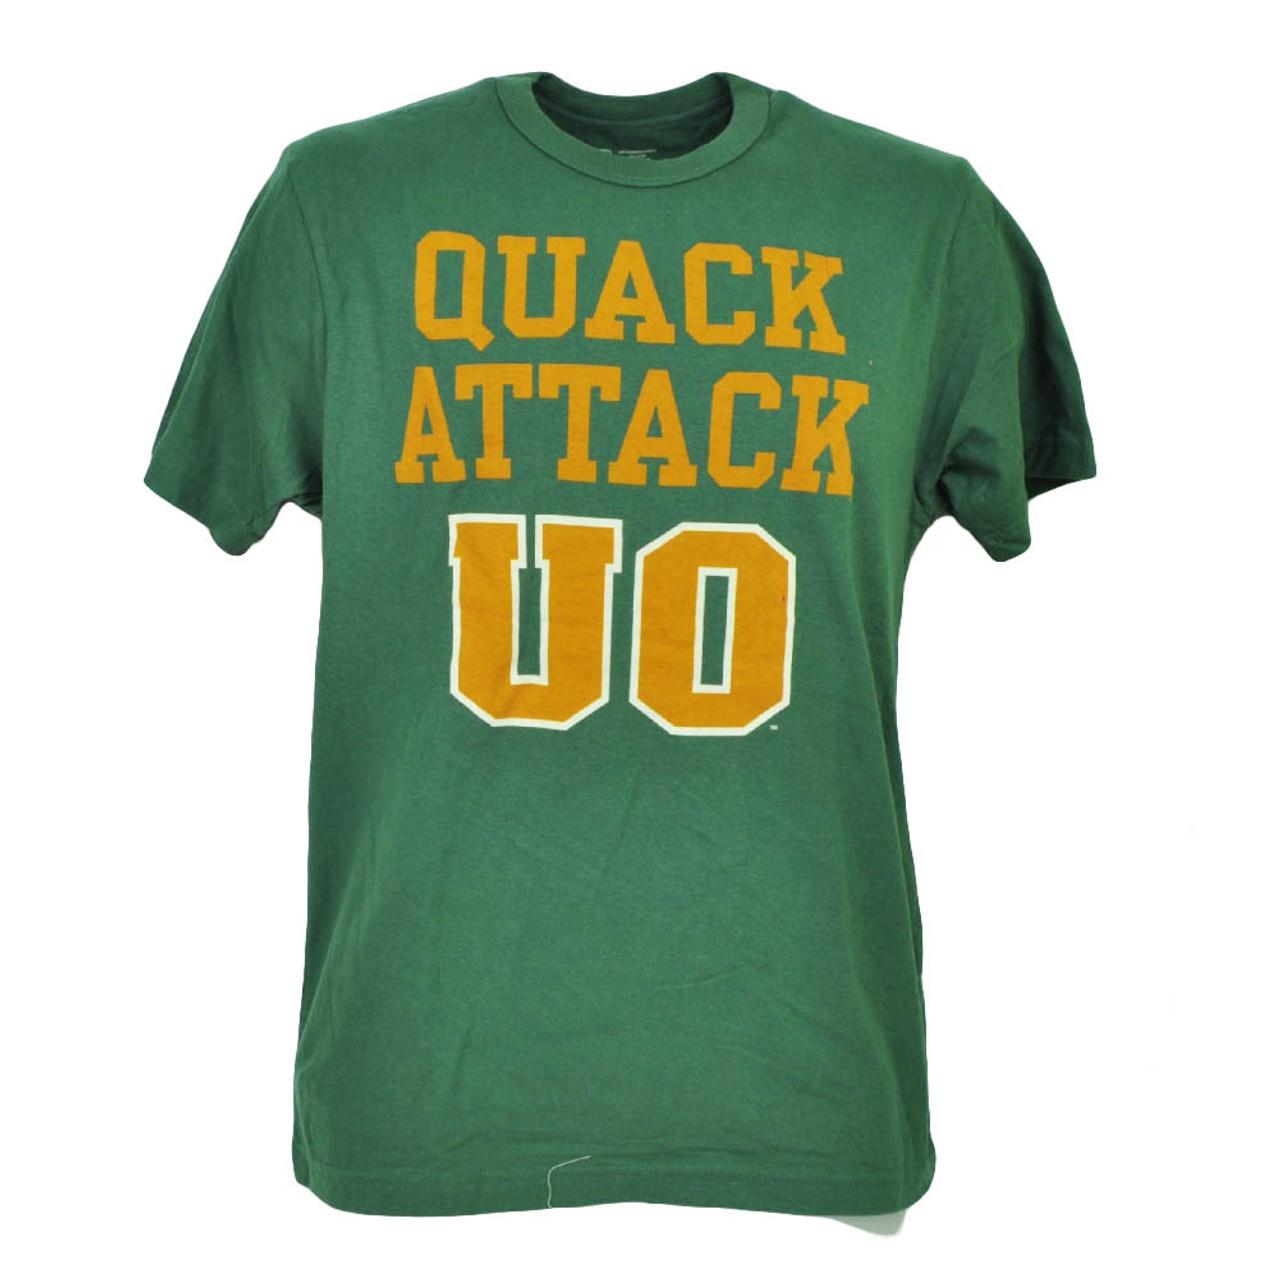 competitive price 43be4 cab2c NCAA Oregon Ducks Quack Attack Green Mens Adult TShirt Tee Crew Neck Sports